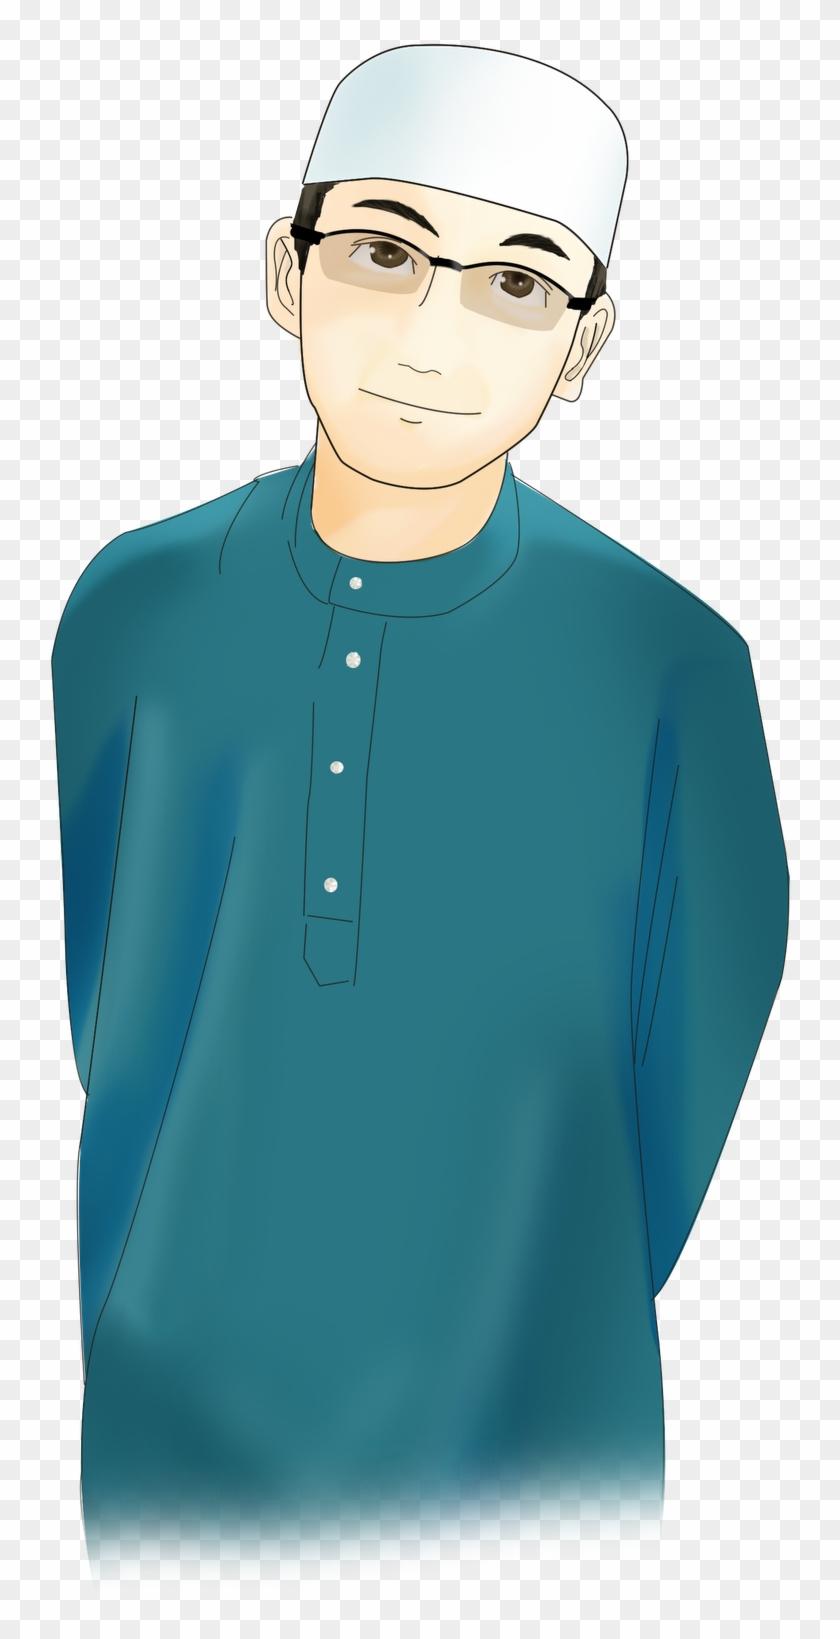 Islam Cartoon Muslim Hijab Man - Muslim Man Image Png #1308105